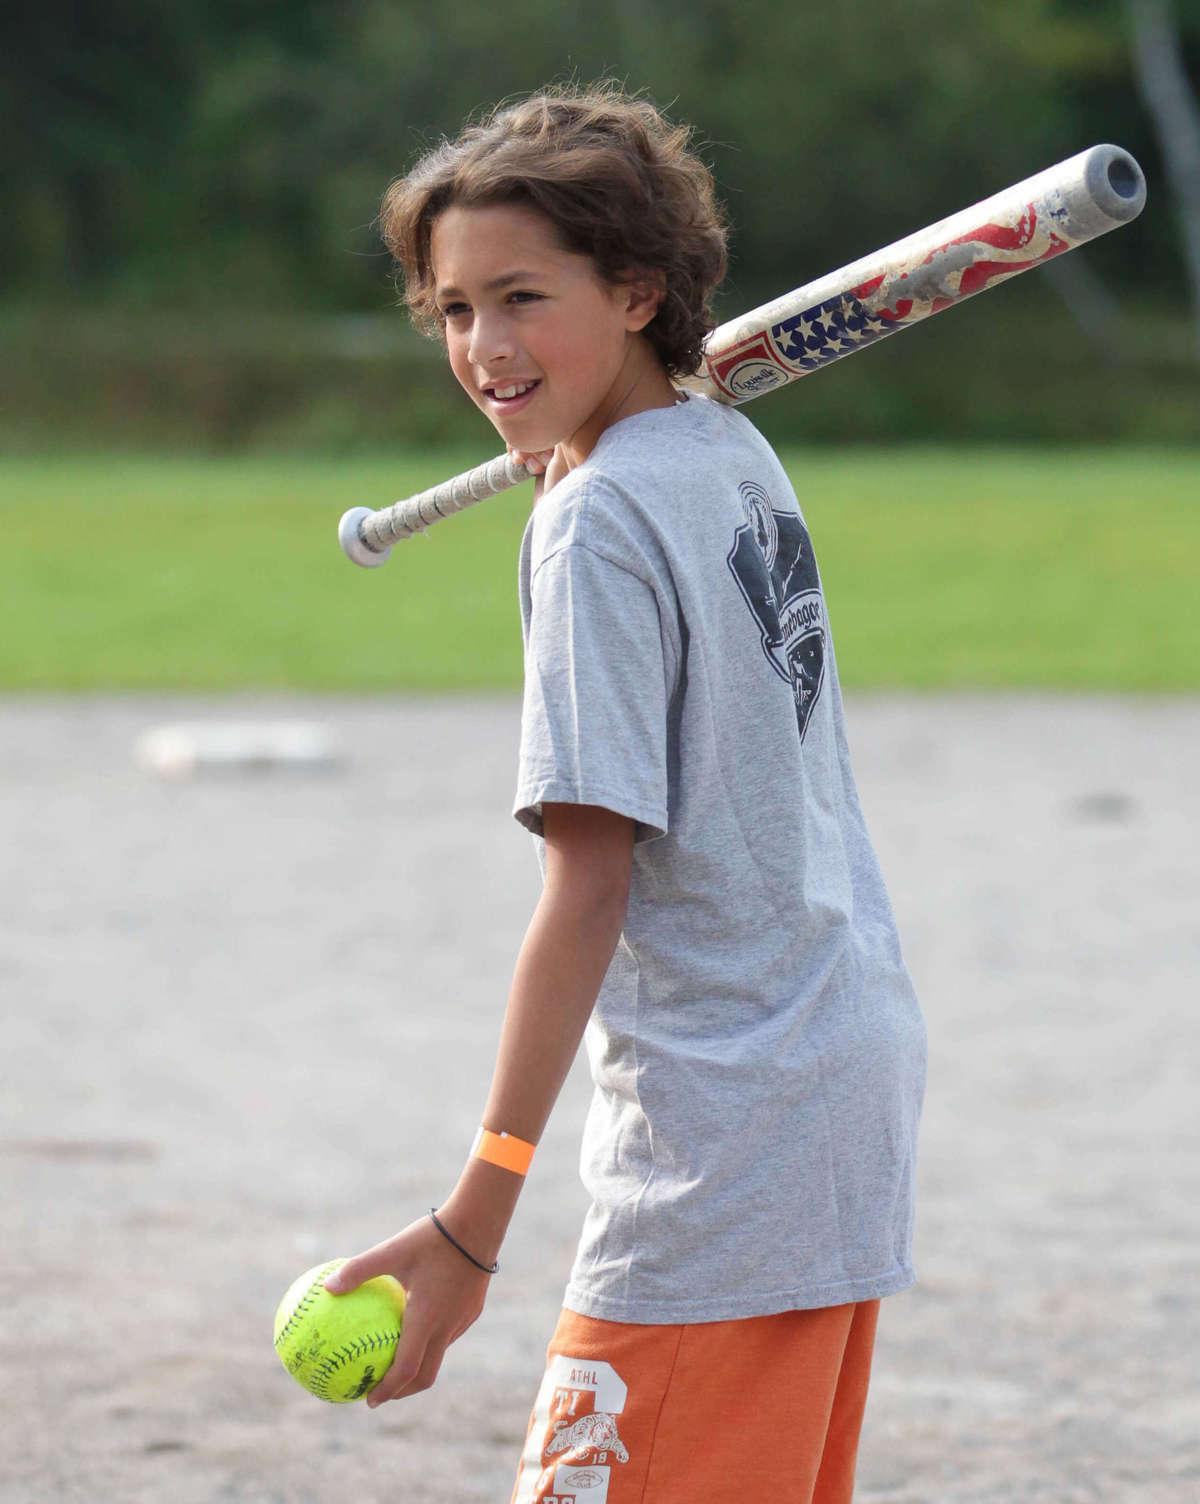 Baseball Coaching Jobs Abroad in Canada - Camp Canada